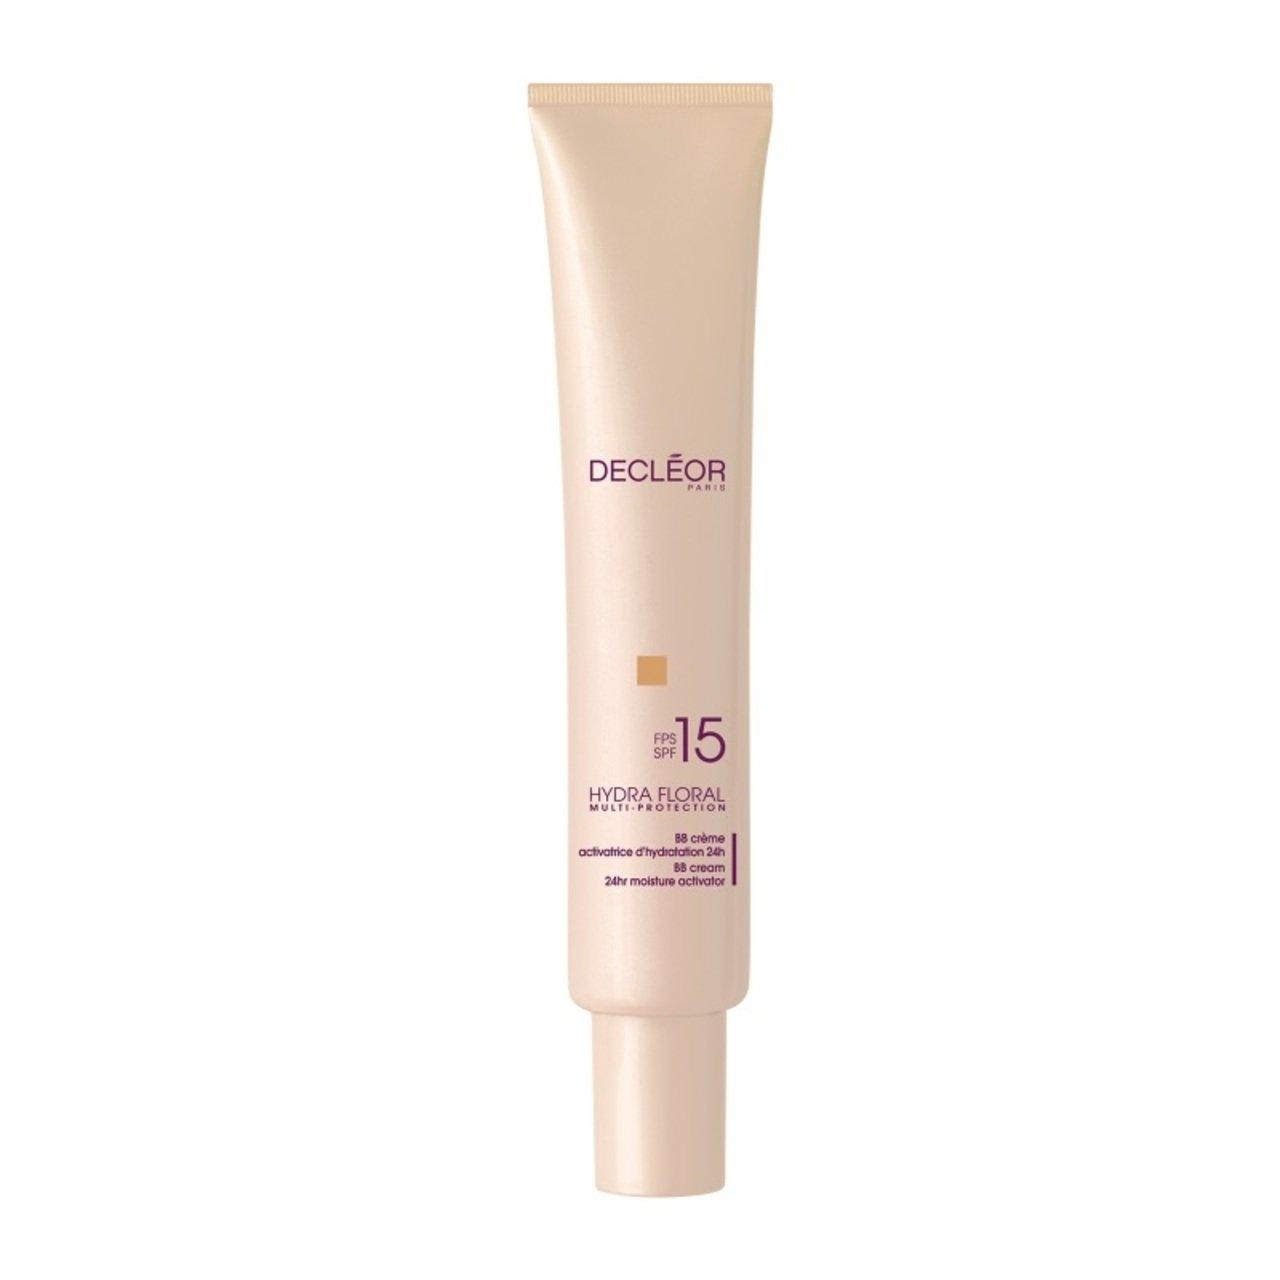 Decleor Hydra Floral Multi Skin Protection Bb Cream 24hr Moisture Medium 40ml